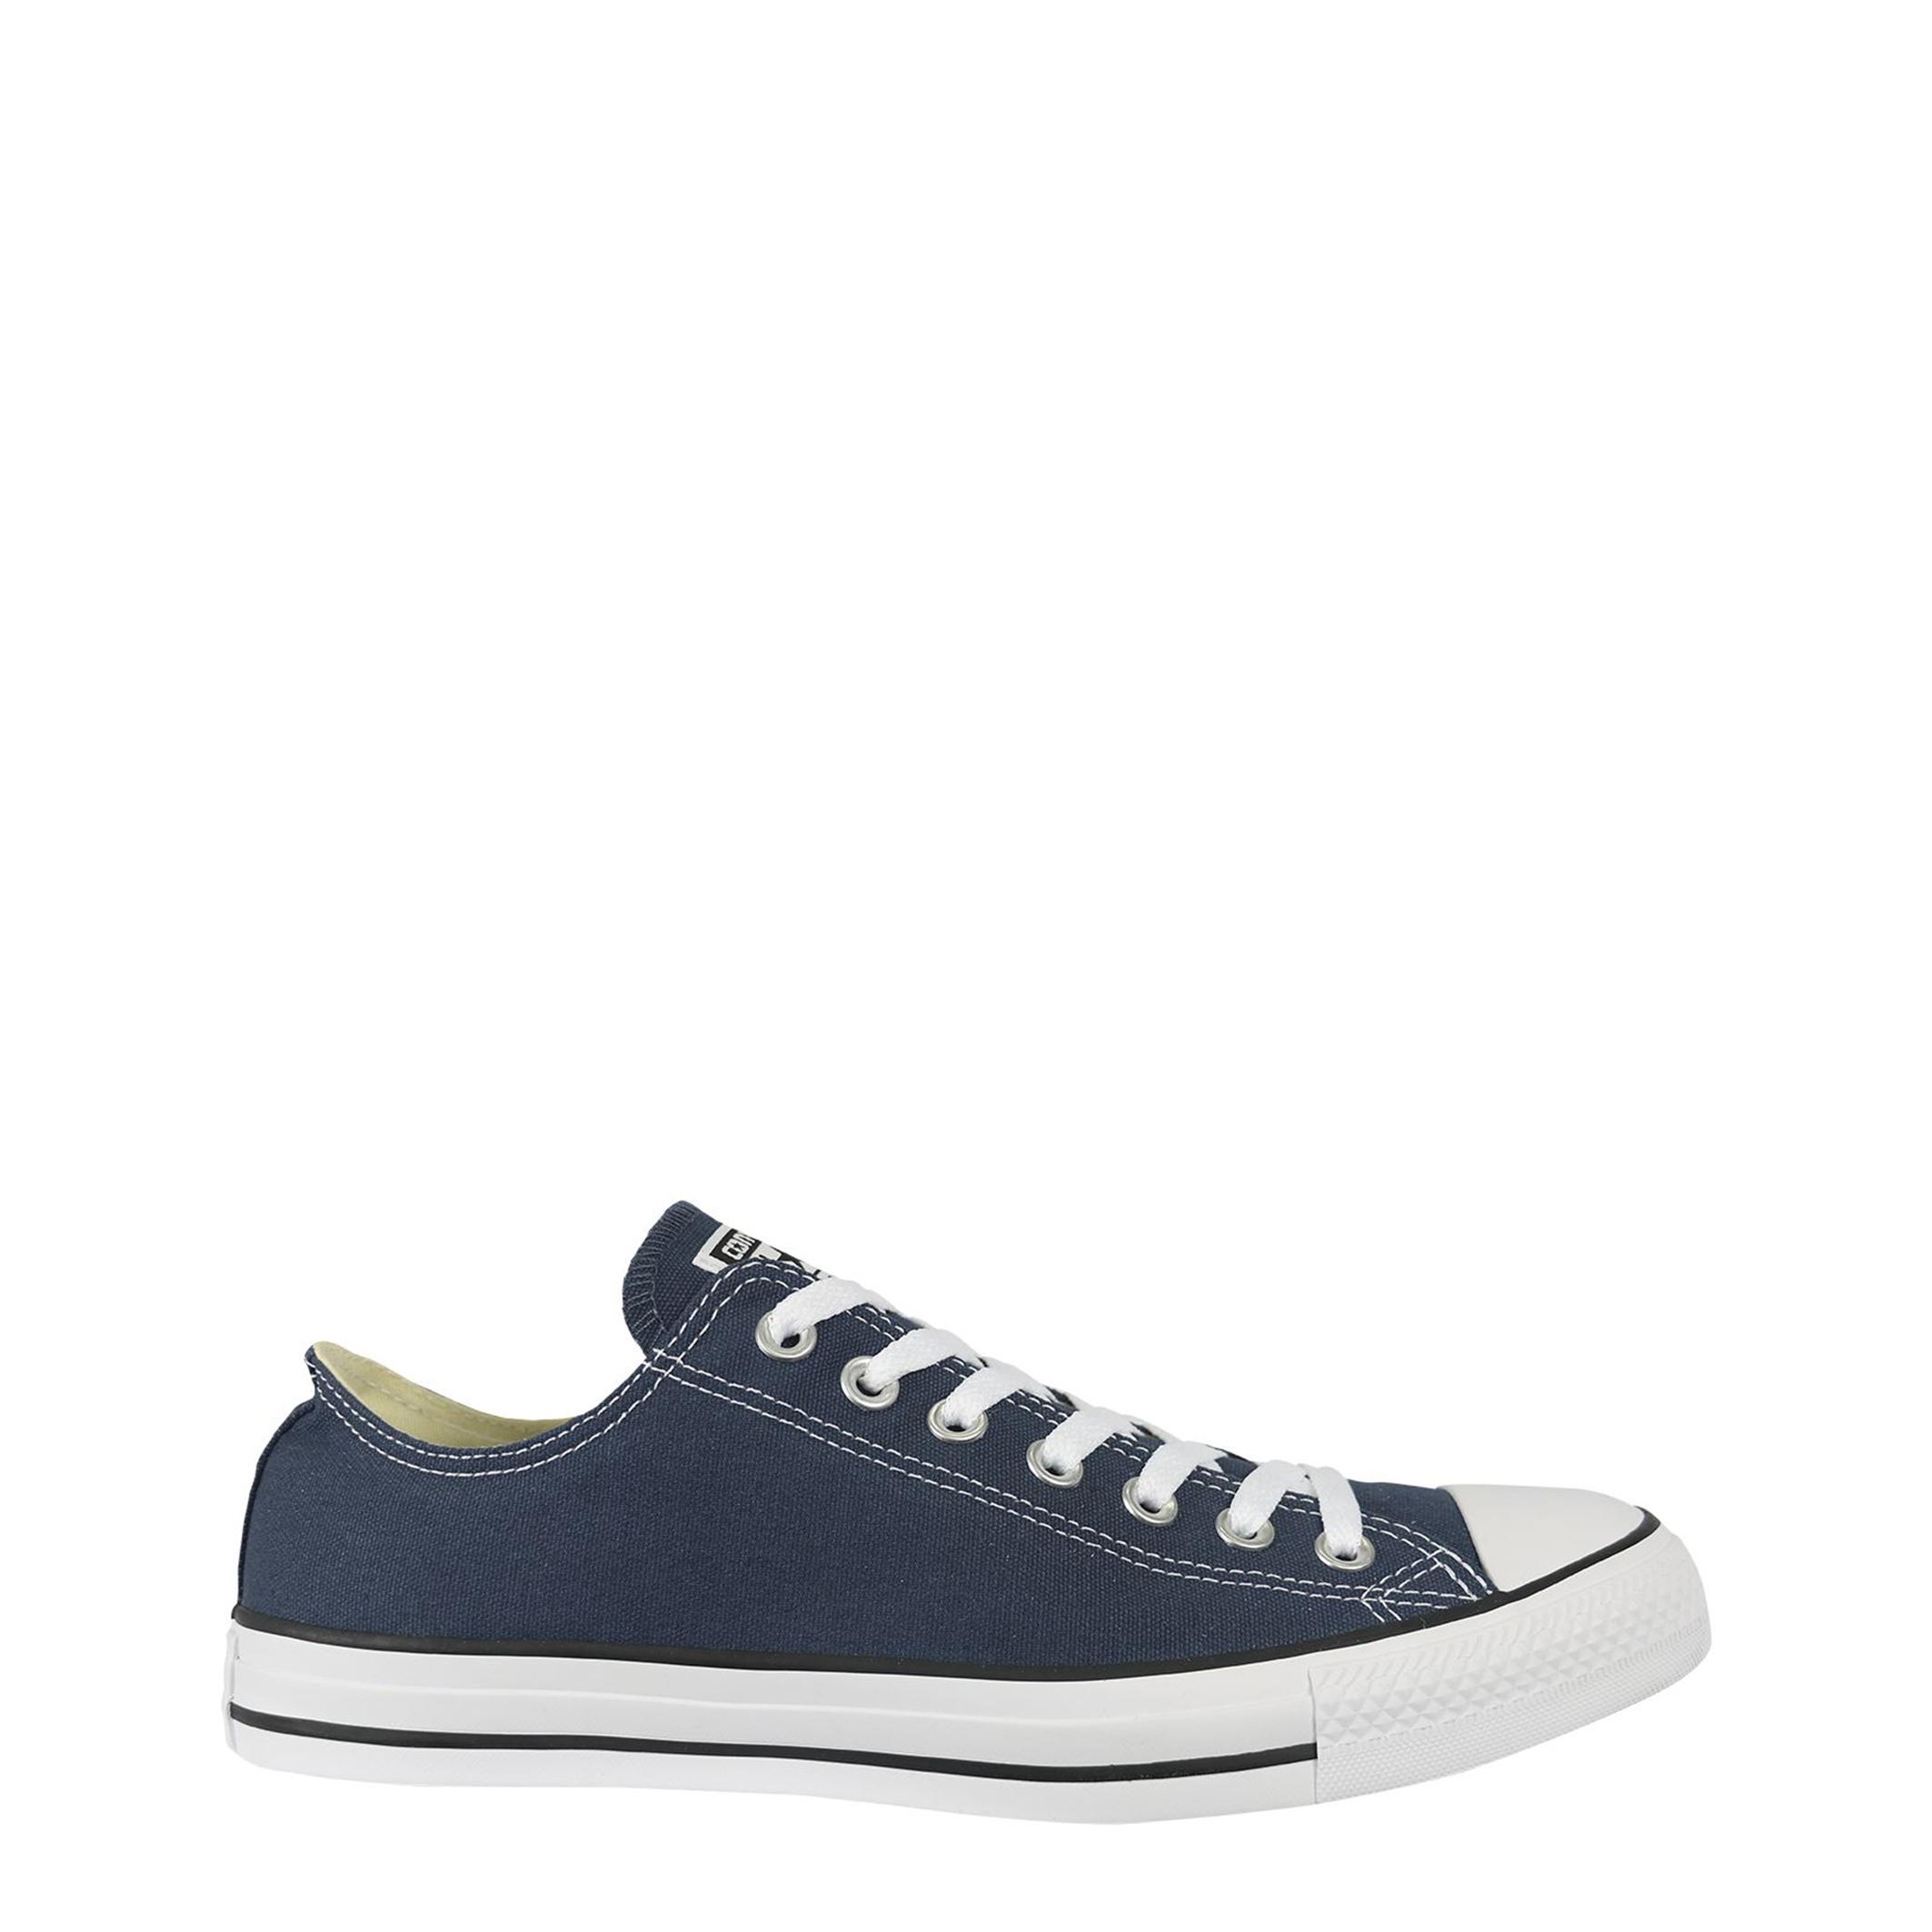 Baskets / Sneakers  Converse M9697 blue